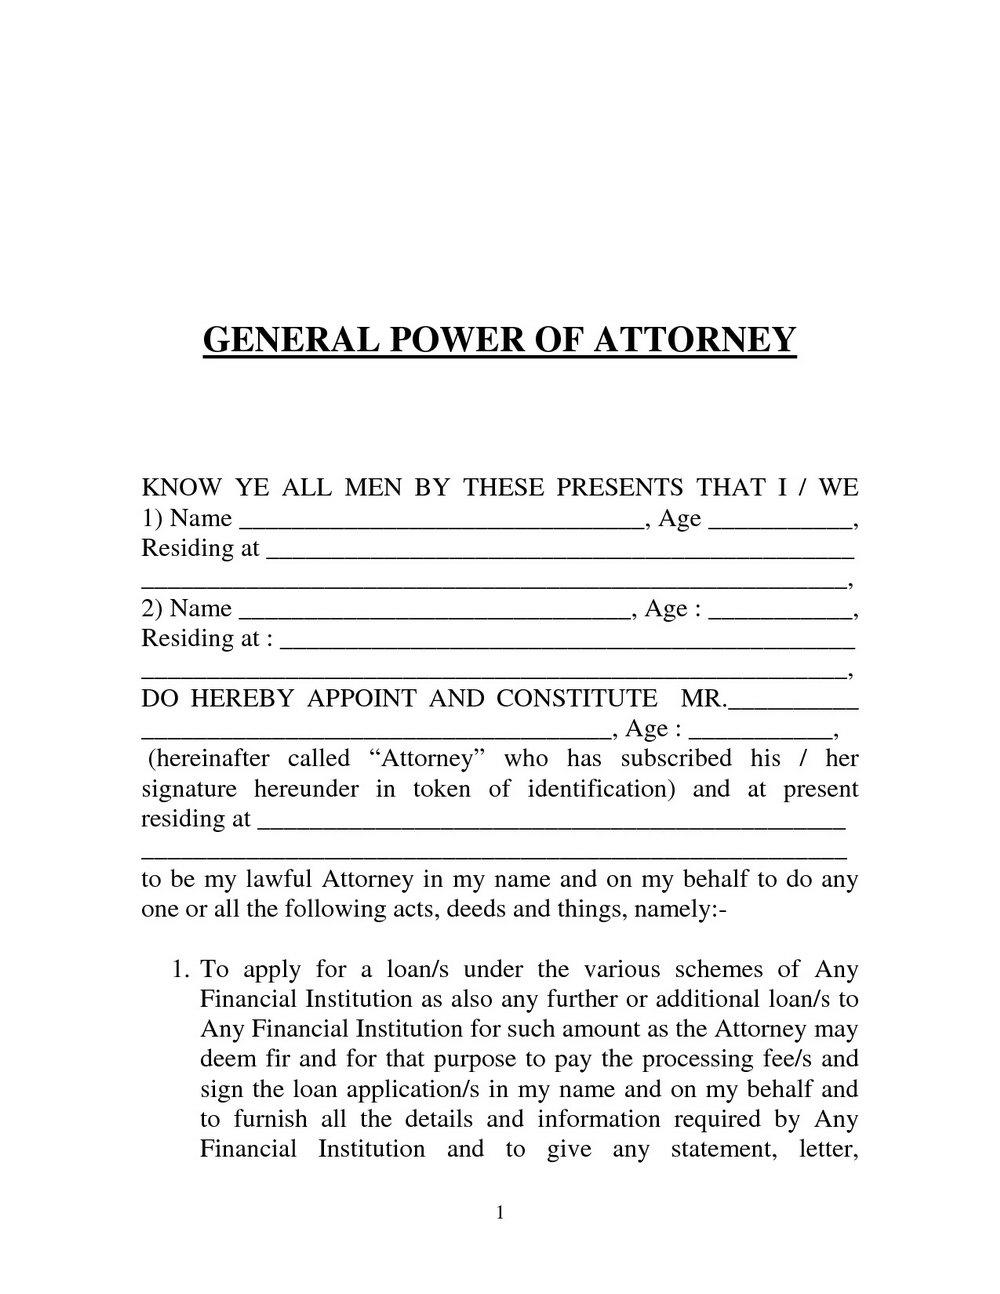 Power Of Attorney Template Pakistan